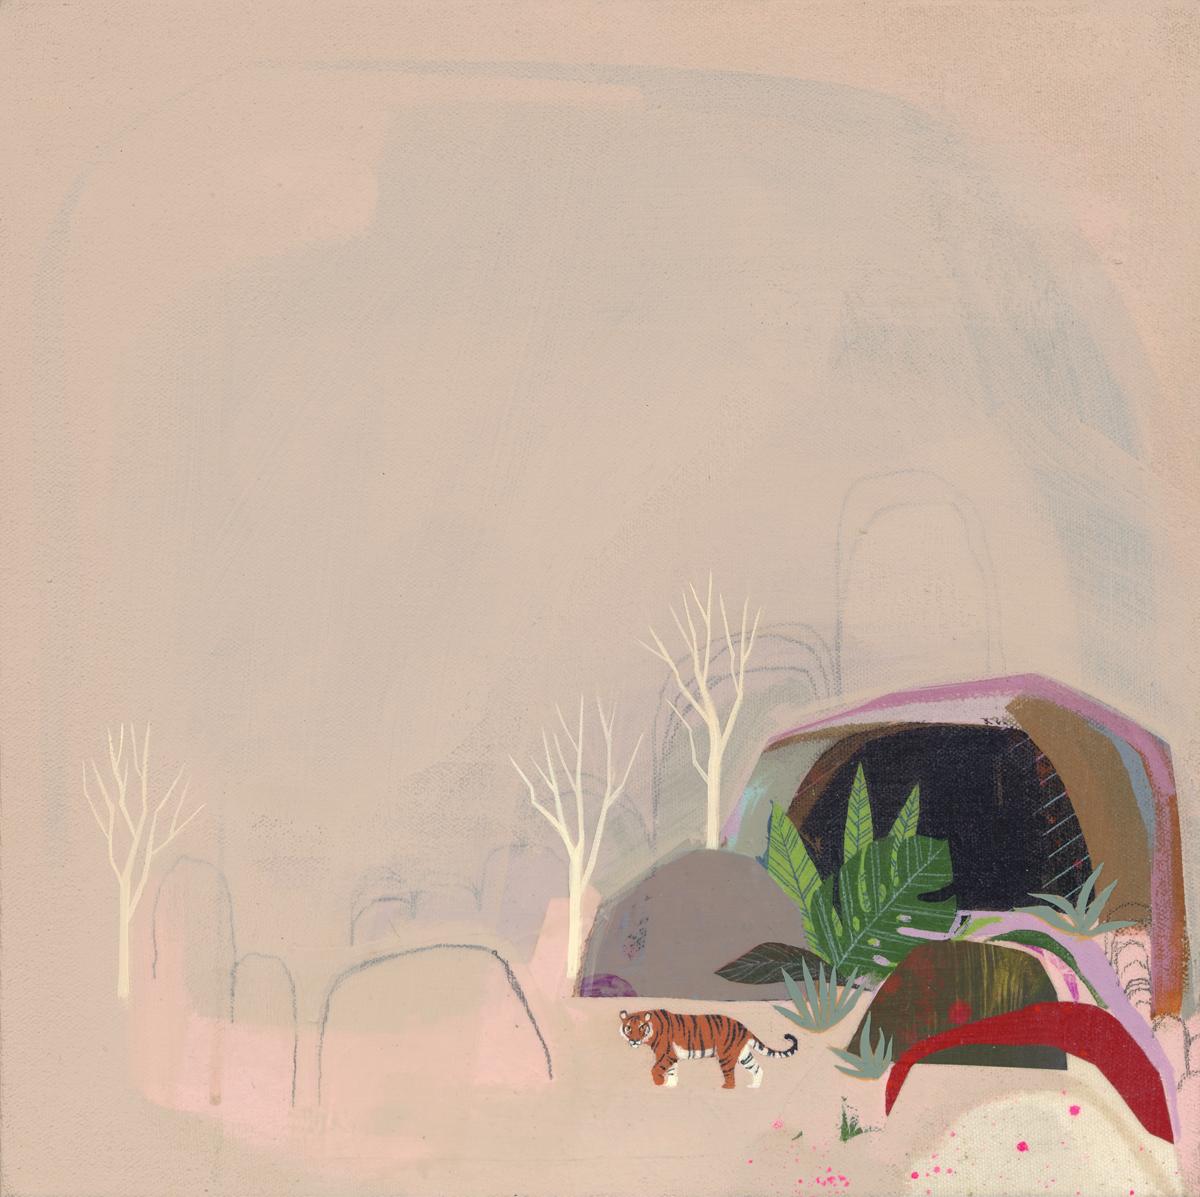 """Dream of the Fight"", 2018, 12 x 12"" Acrylic on Canvas. This piece is part of GR2's 15th Anniversary Show. August 4 - 15, 2018  A group exhibition featuring  Ako Castuera, Robert Sato, Darren and Trish Inouye, Theo Ellsworth, Dehara Yukinori, KAMI Hitotzuki, Jeni Yang, Huntz Liu, Sean Chao, Shizu Saldamando, Stickymonger, Mari Inukai, Godeleine de Rosamel, Geoff McFetridge, Seonna Hong, Yusei Abe, Jen Tong, Yoskay Yamamoto, Susie Ghahremani, Stella Im Hultberg, Gary Baseman, Mark Todd, Esther Park Watson, Nikki McClure, Linnea Strid, Mark Nagata, Ed Trask, Matt Furie, Albert Reyes, Luke Chueh, Deth P Sun, kozyndan, Shawn Cheng, Nathan Ota, Maggie Chiang, Andrew Hem"